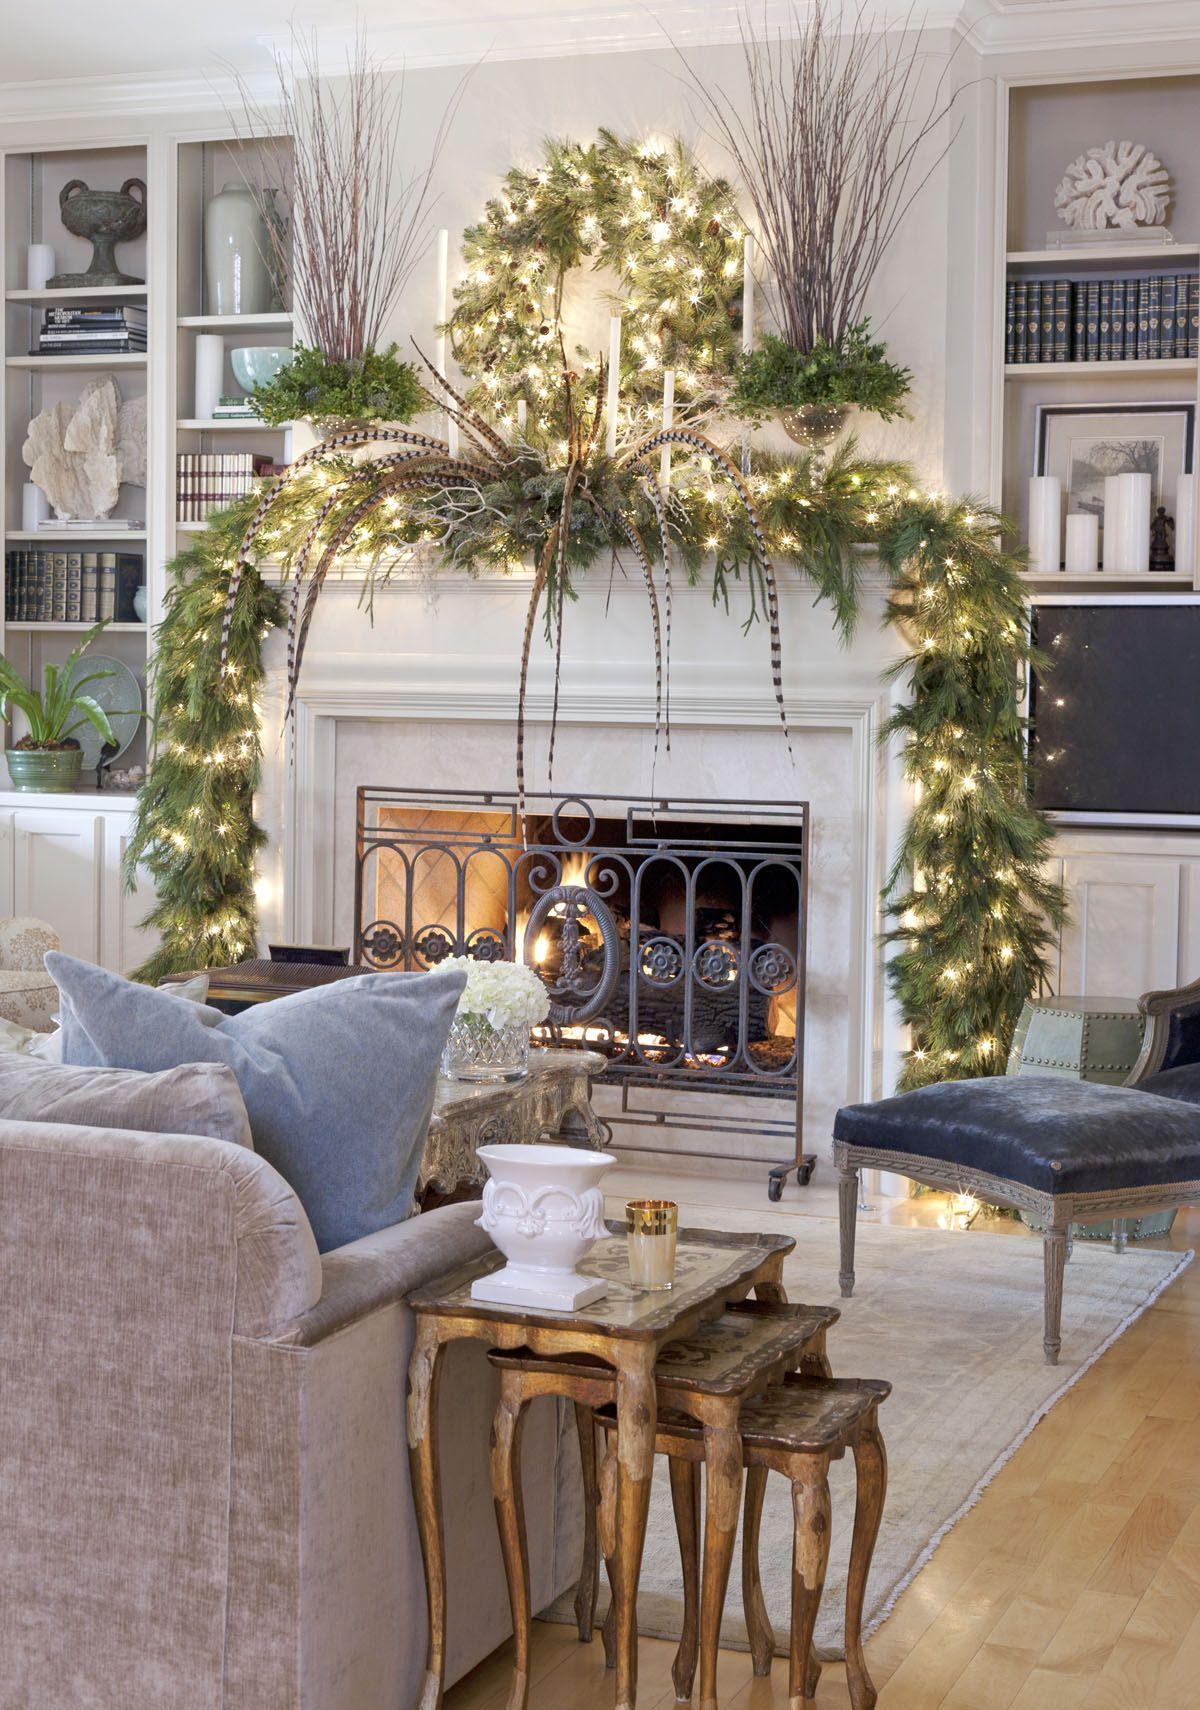 30 Modern Christmas Decor Ideas For Delightful Winter Holidays Freshome Com Christmas Mantel Decorations Fabulous Christmas Christmas Mantels